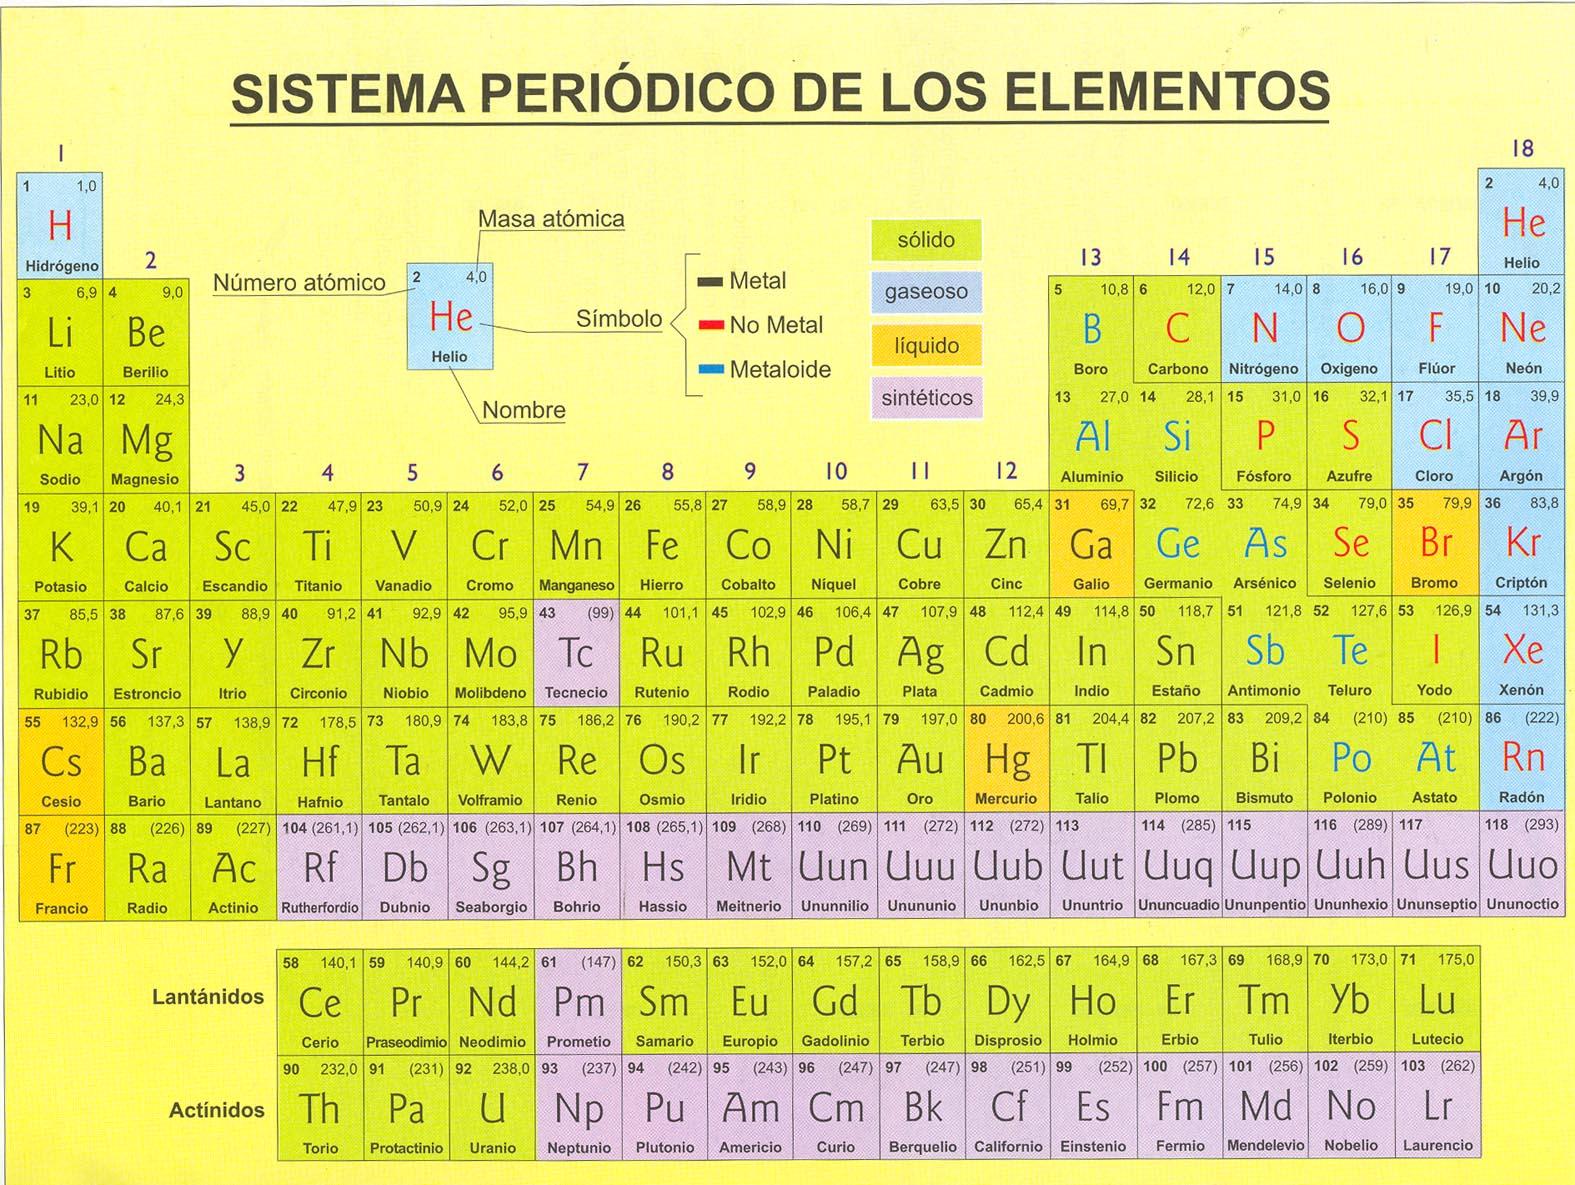 Tabla peridica de los elementos qumicos raiz cuadrada tabla peridica urtaz Images